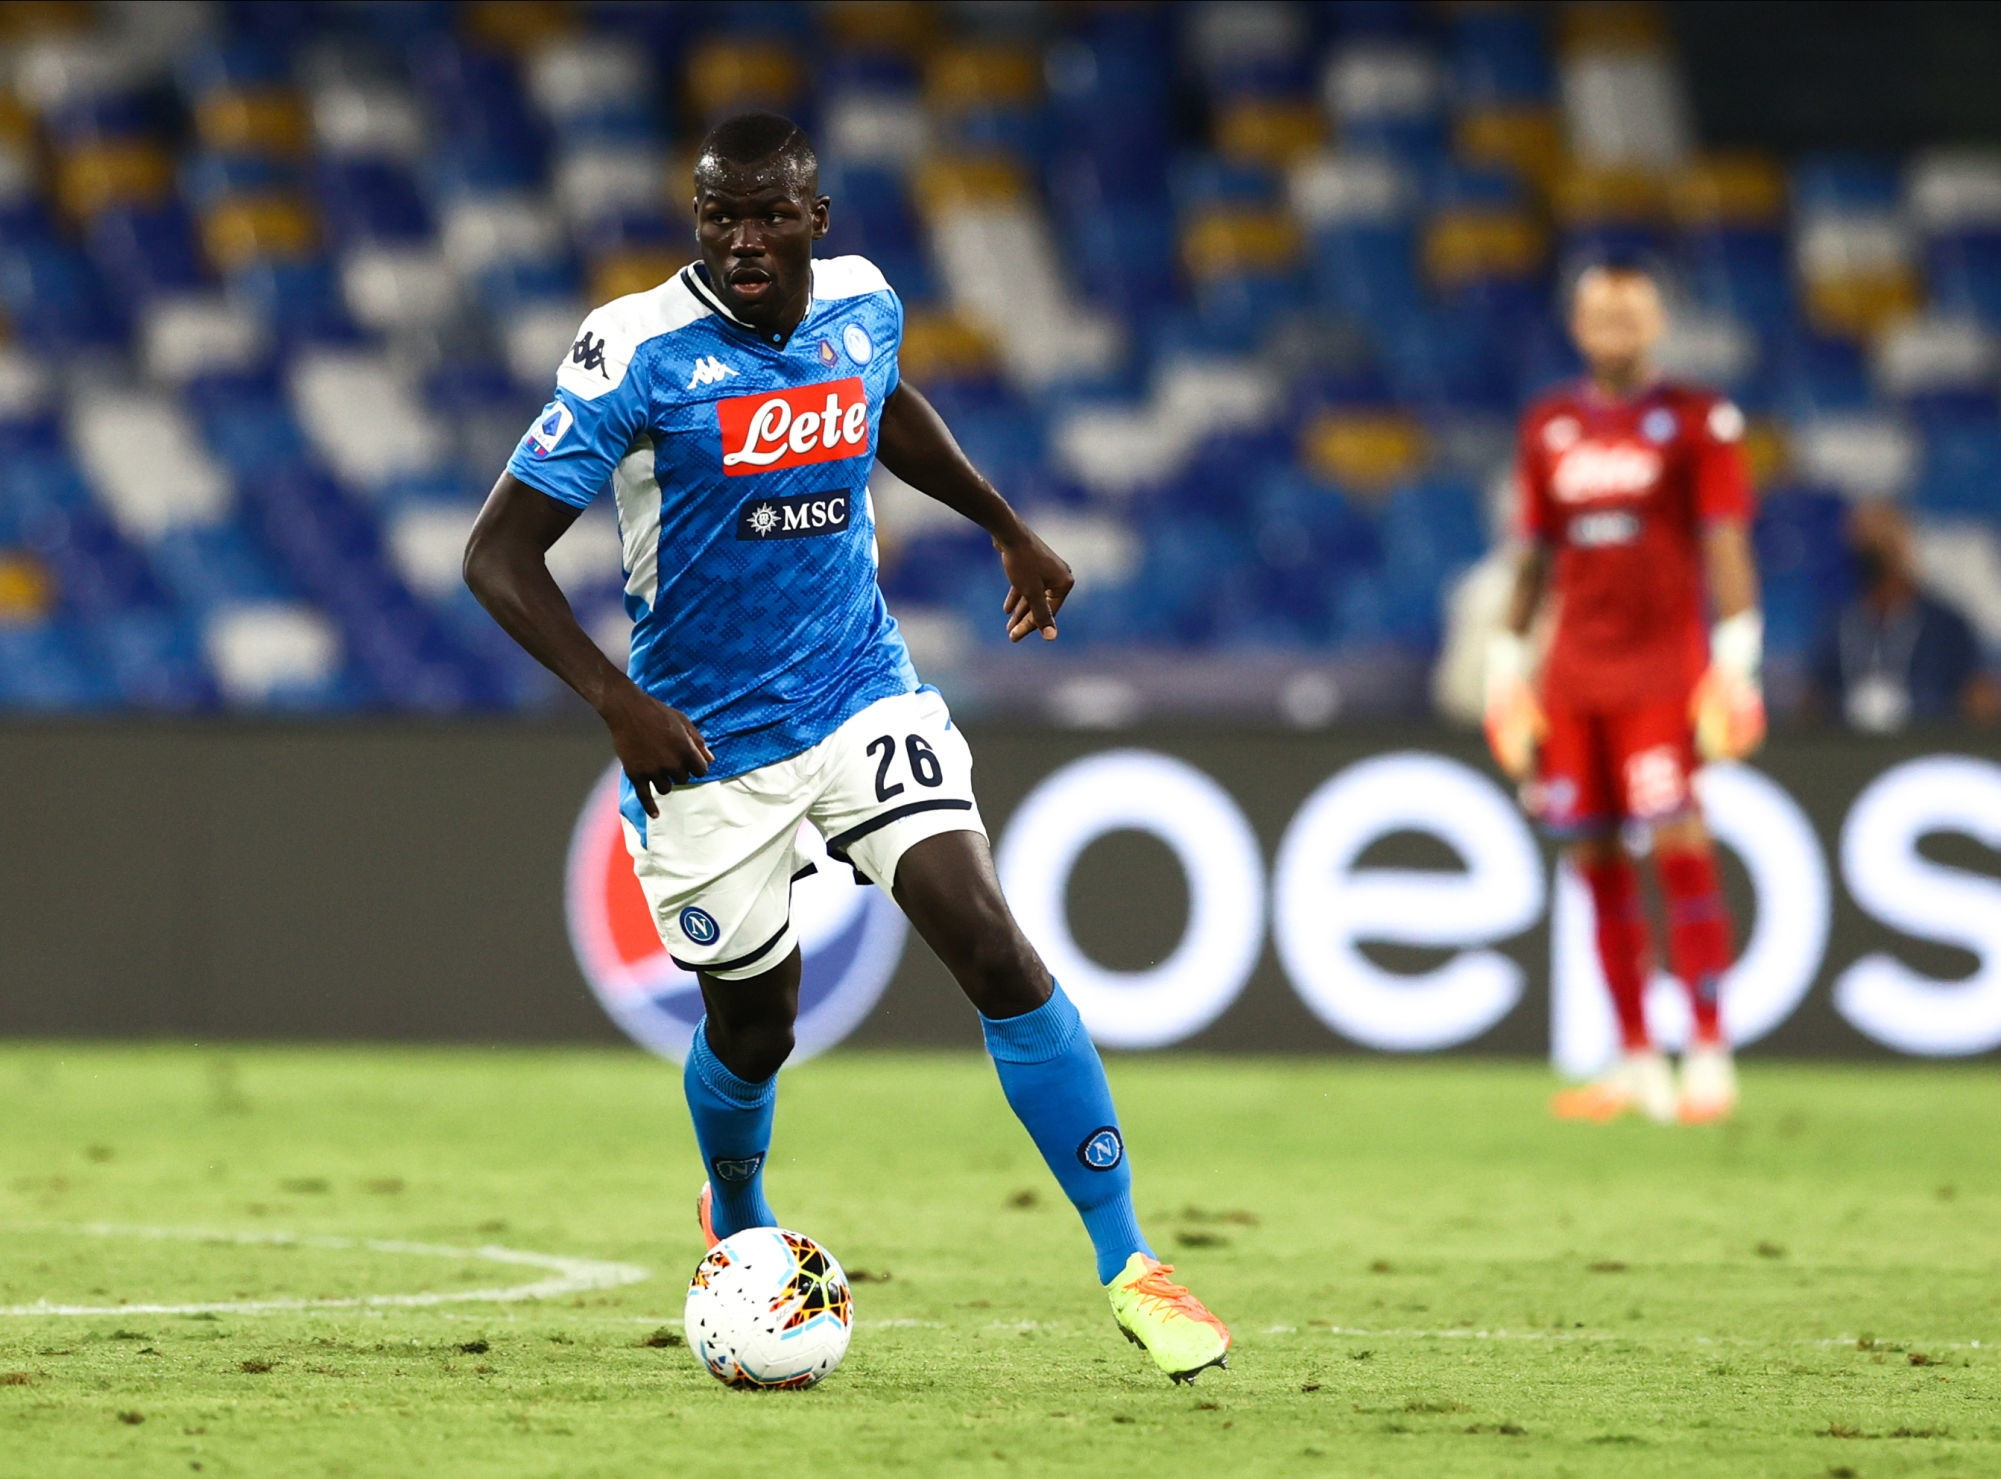 Mercato - Leonardo s'est renseignée pour Koulibaly, selon le Corriere dello Sport